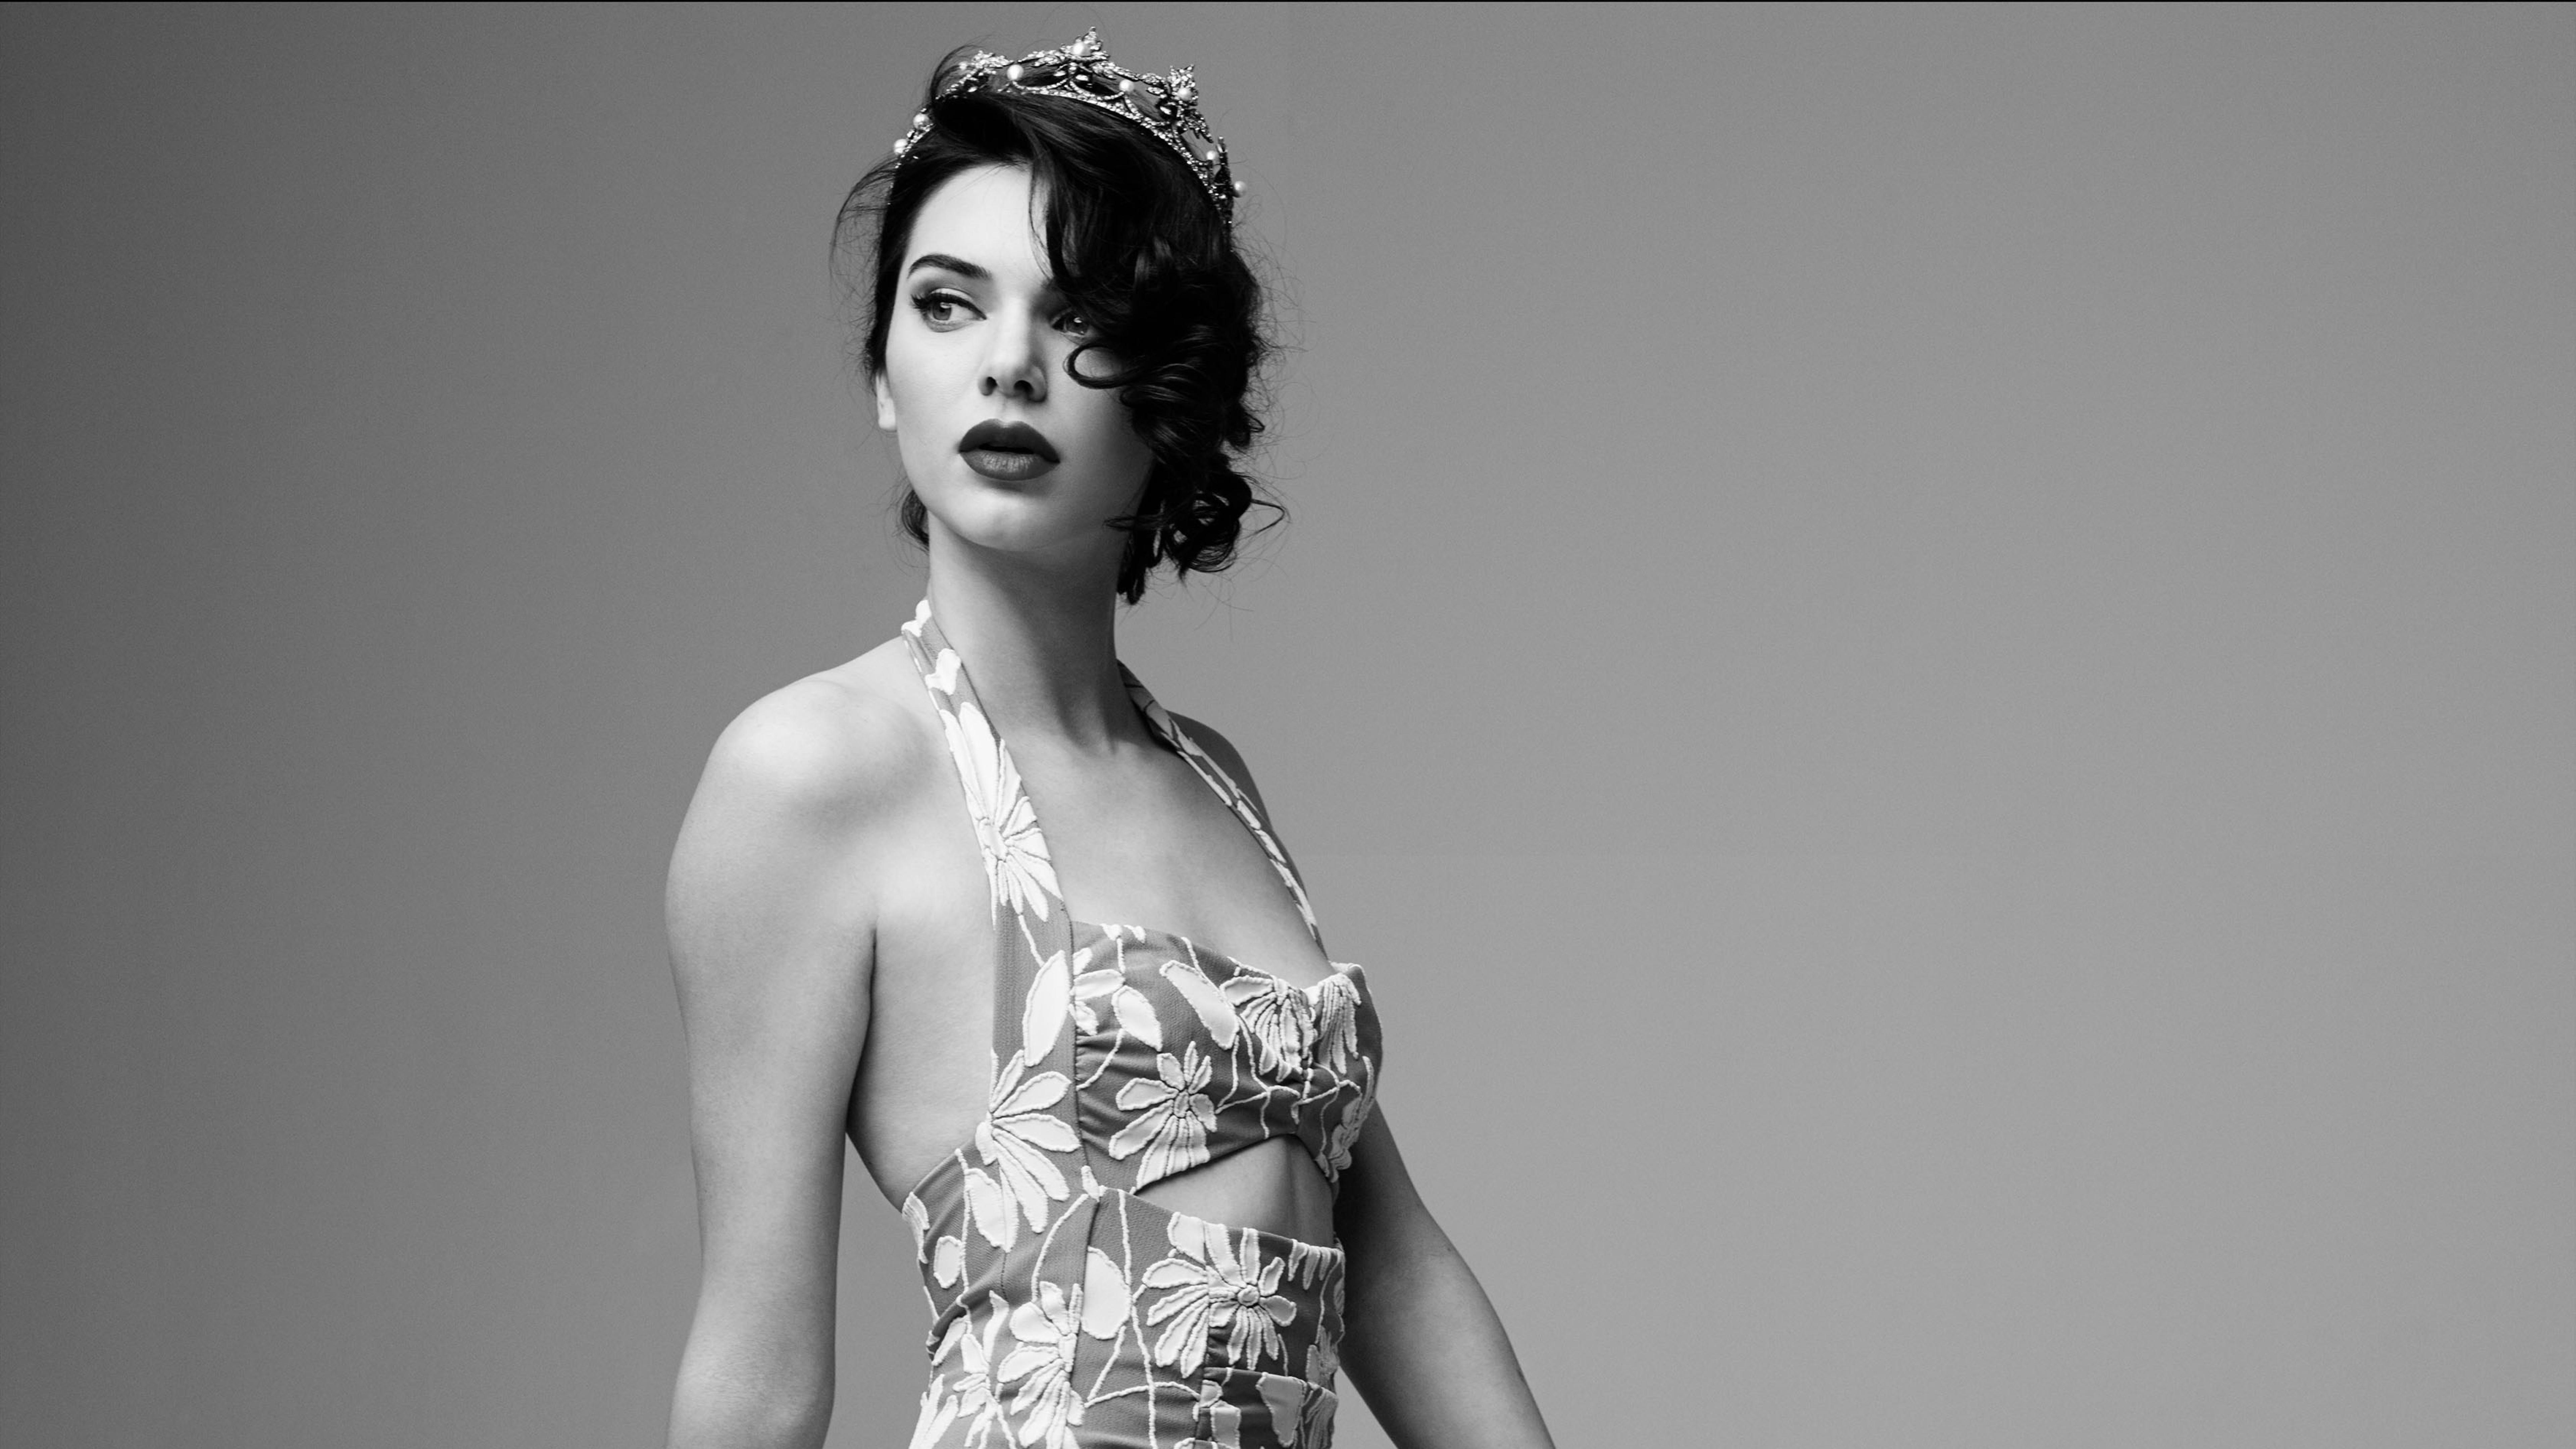 kendall jenner marilyn monroe black and white photoshoot